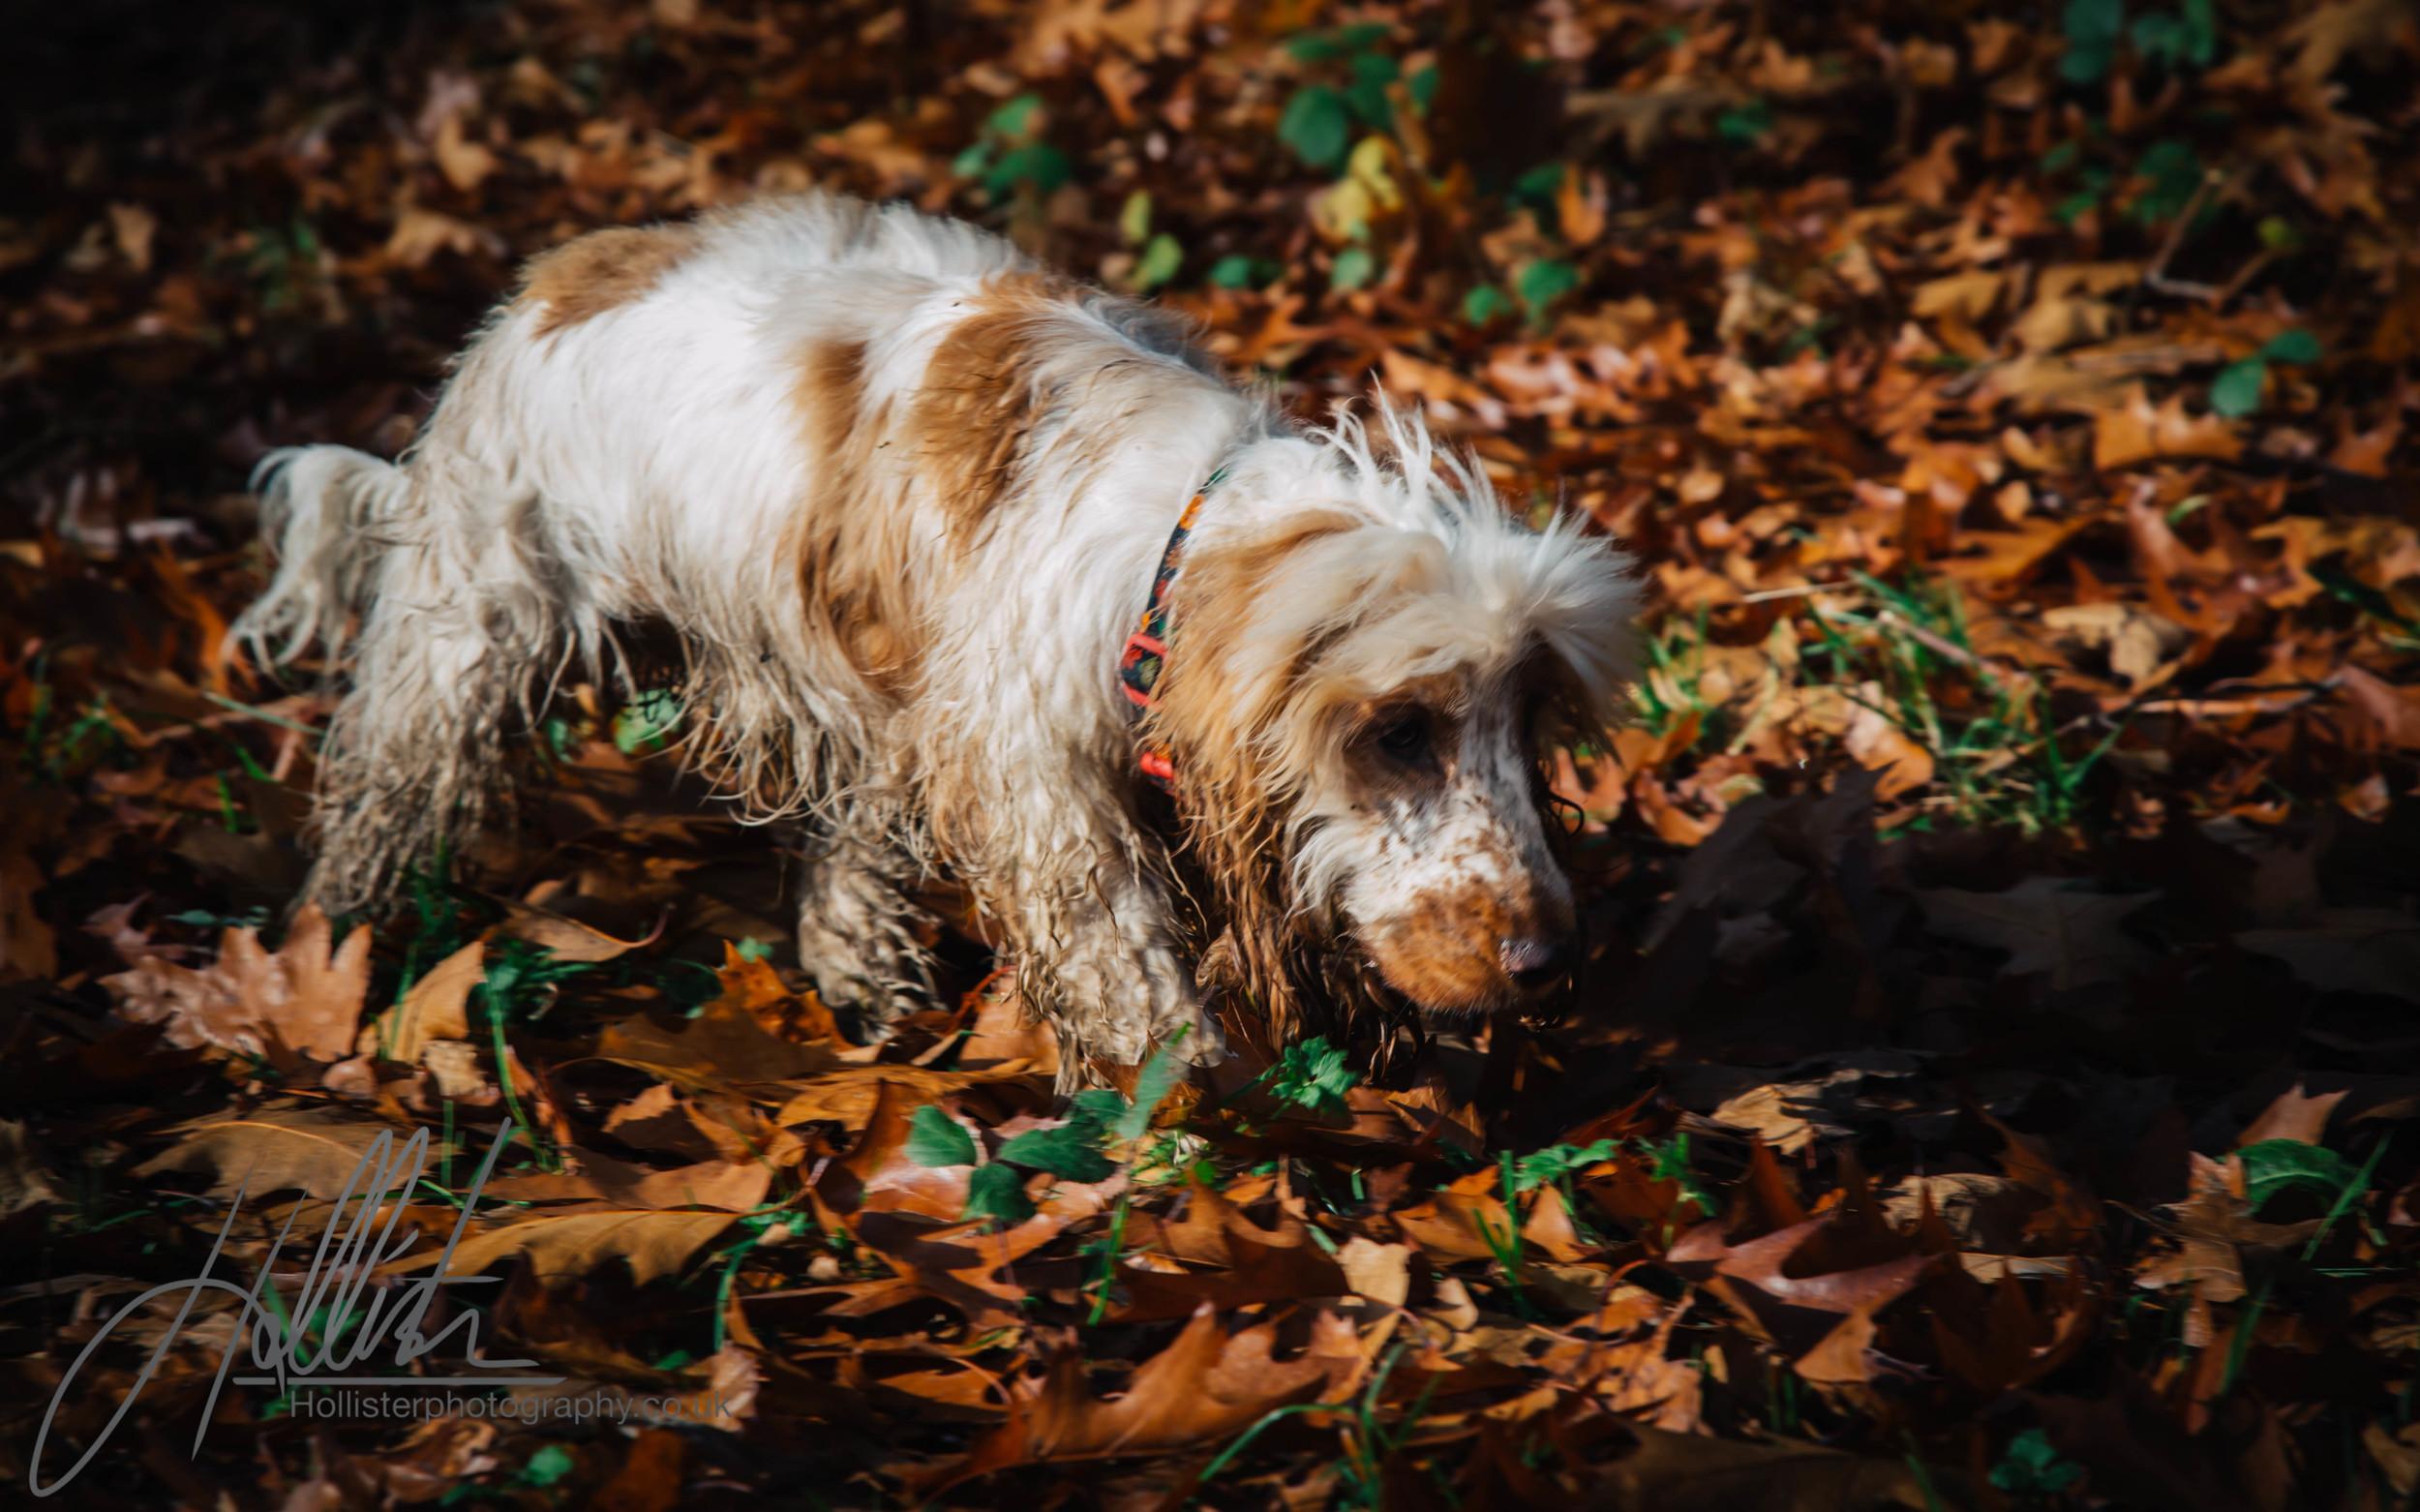 Hollisterphotography ABBY CLOWES WOOD DOG WALK-67.JPG